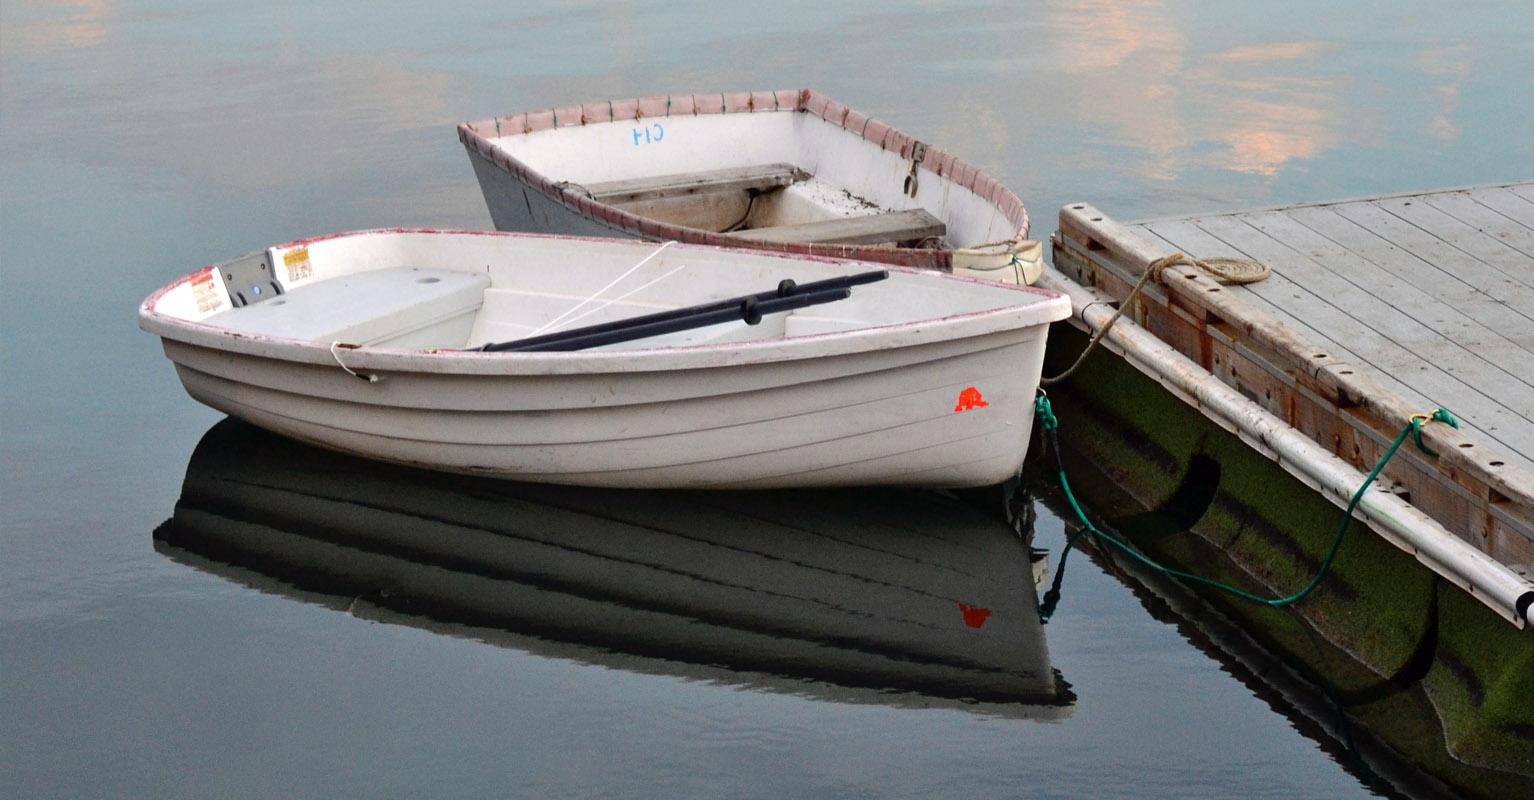 Emergency Roadside Service >> Kayak, Canoe, Dinghy Insurance | American Family Insurance